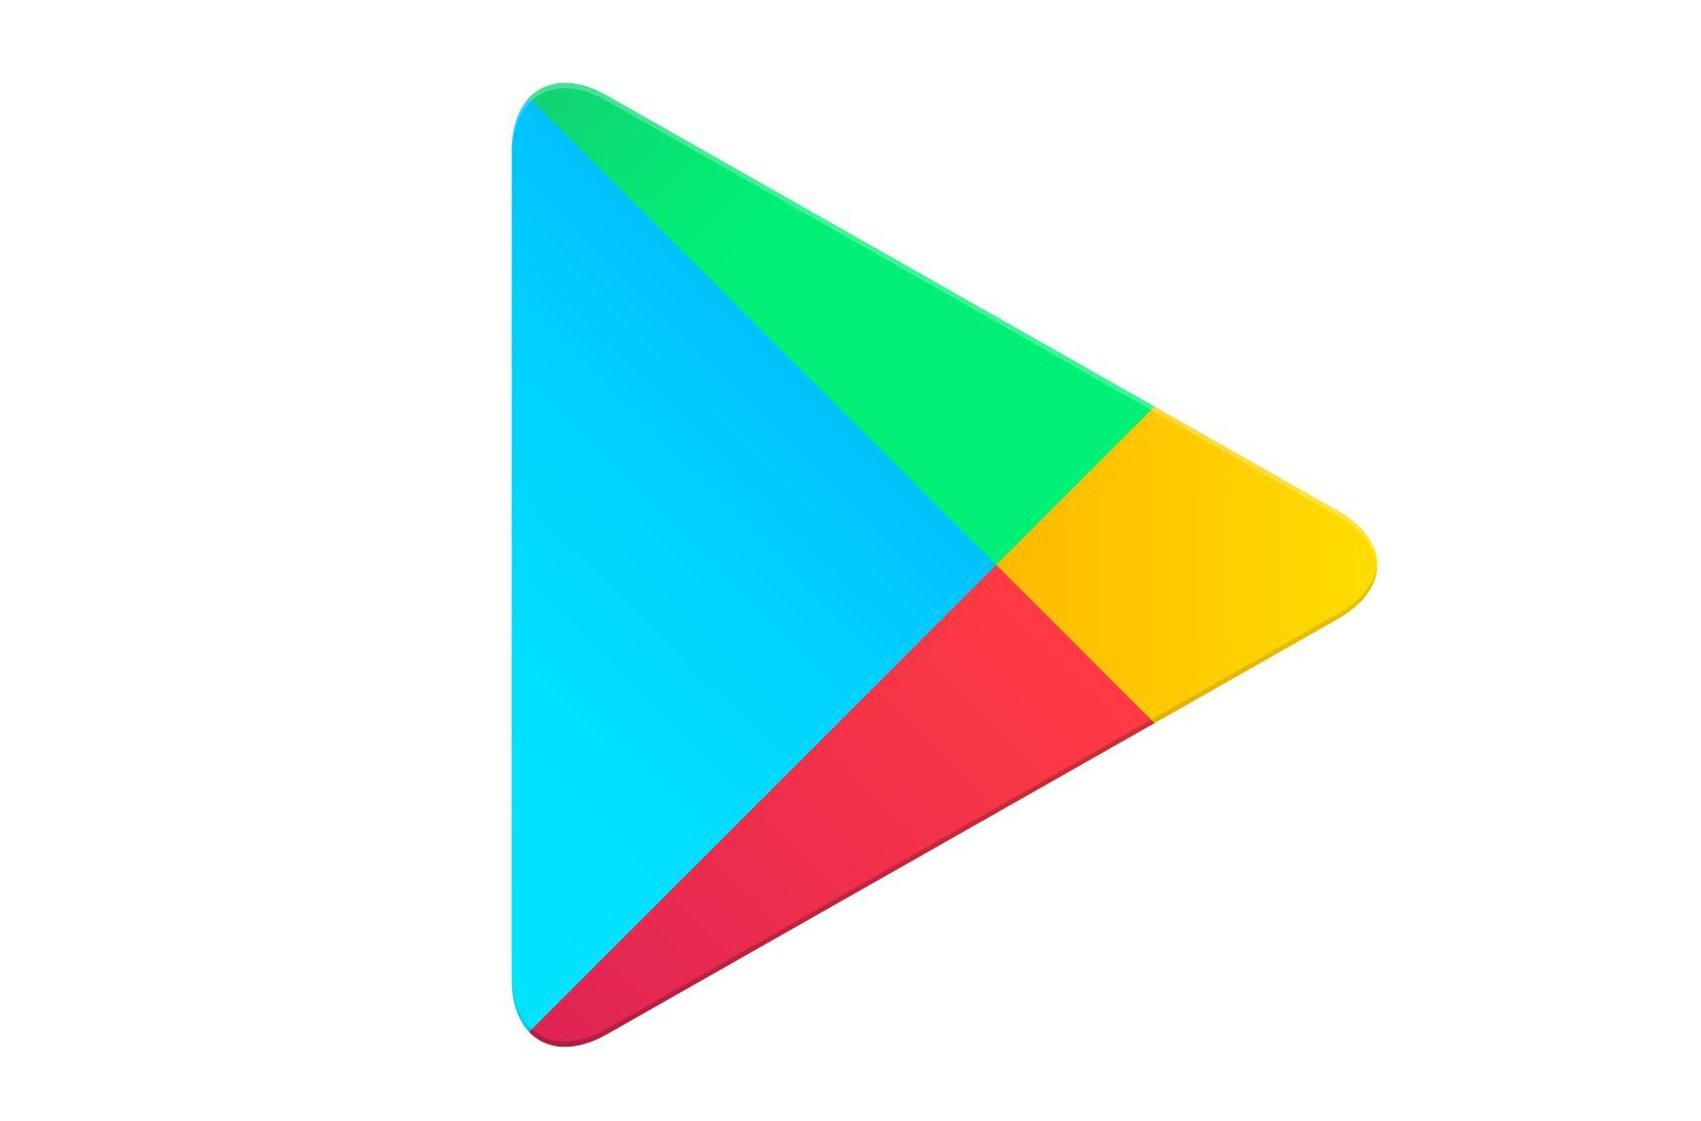 داستان لوگوی Google play